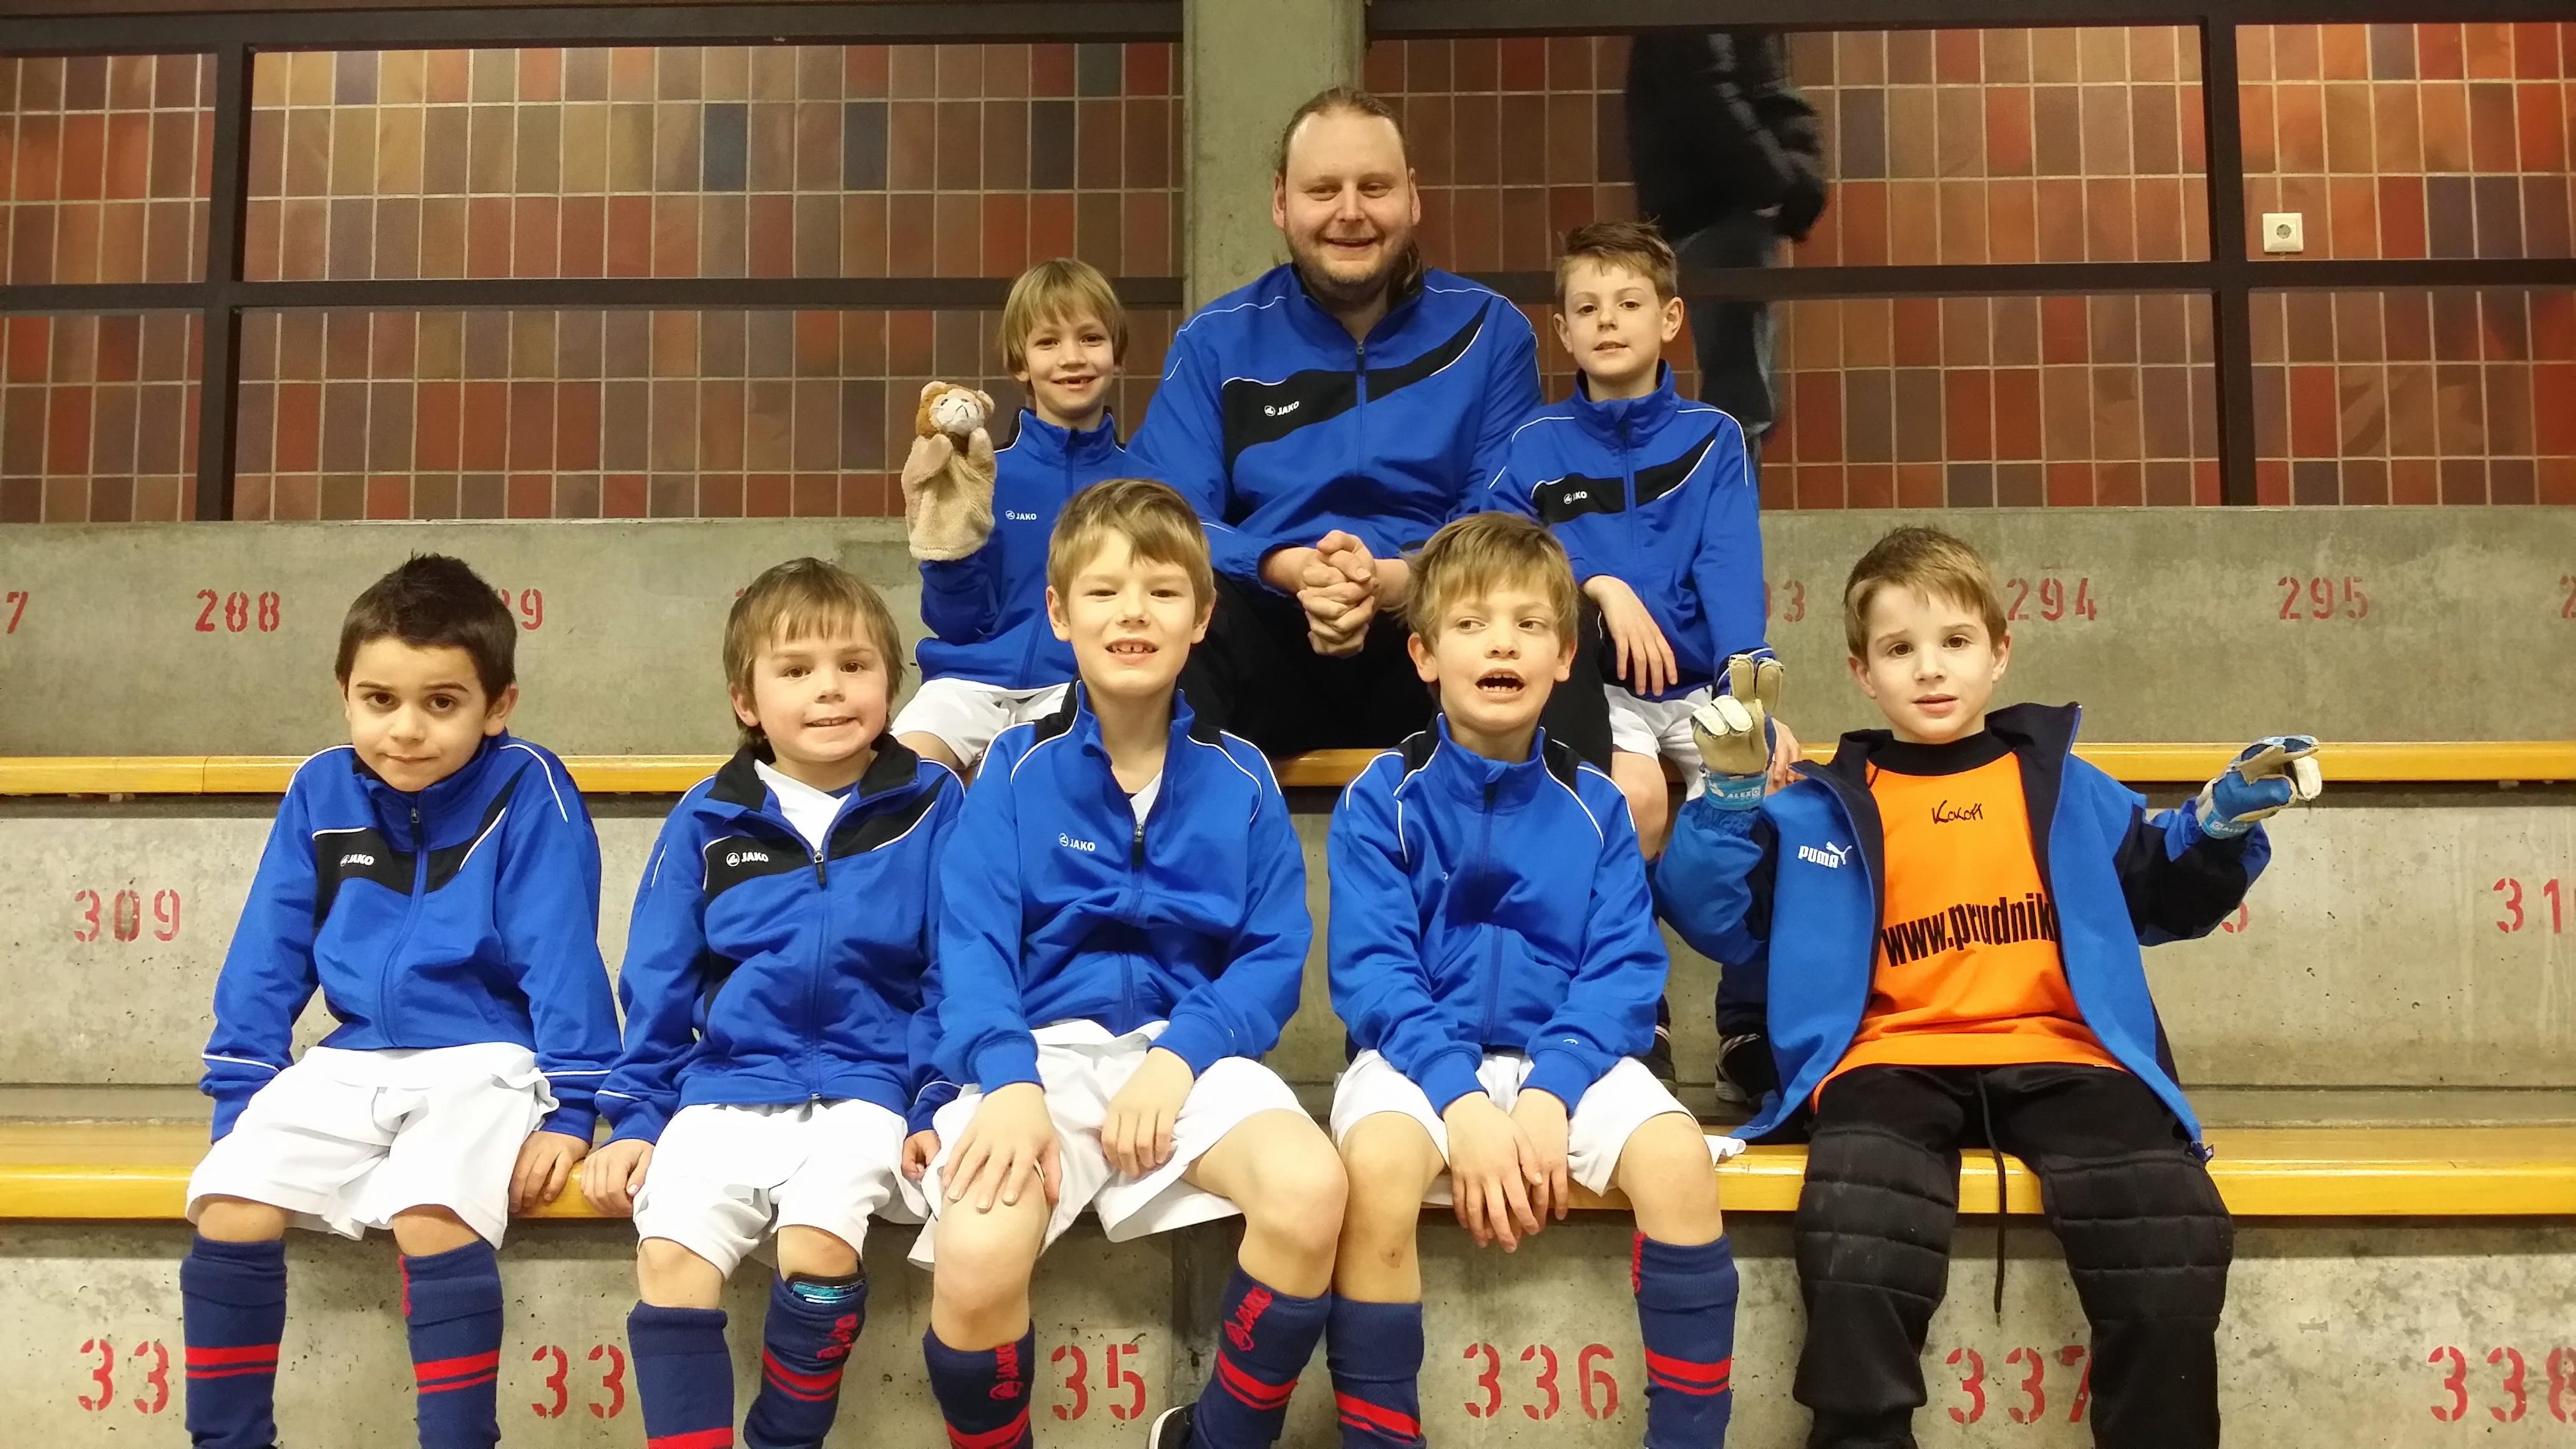 1.3.2014 – Hallenturnier F2-Junioren in Kelsterbach